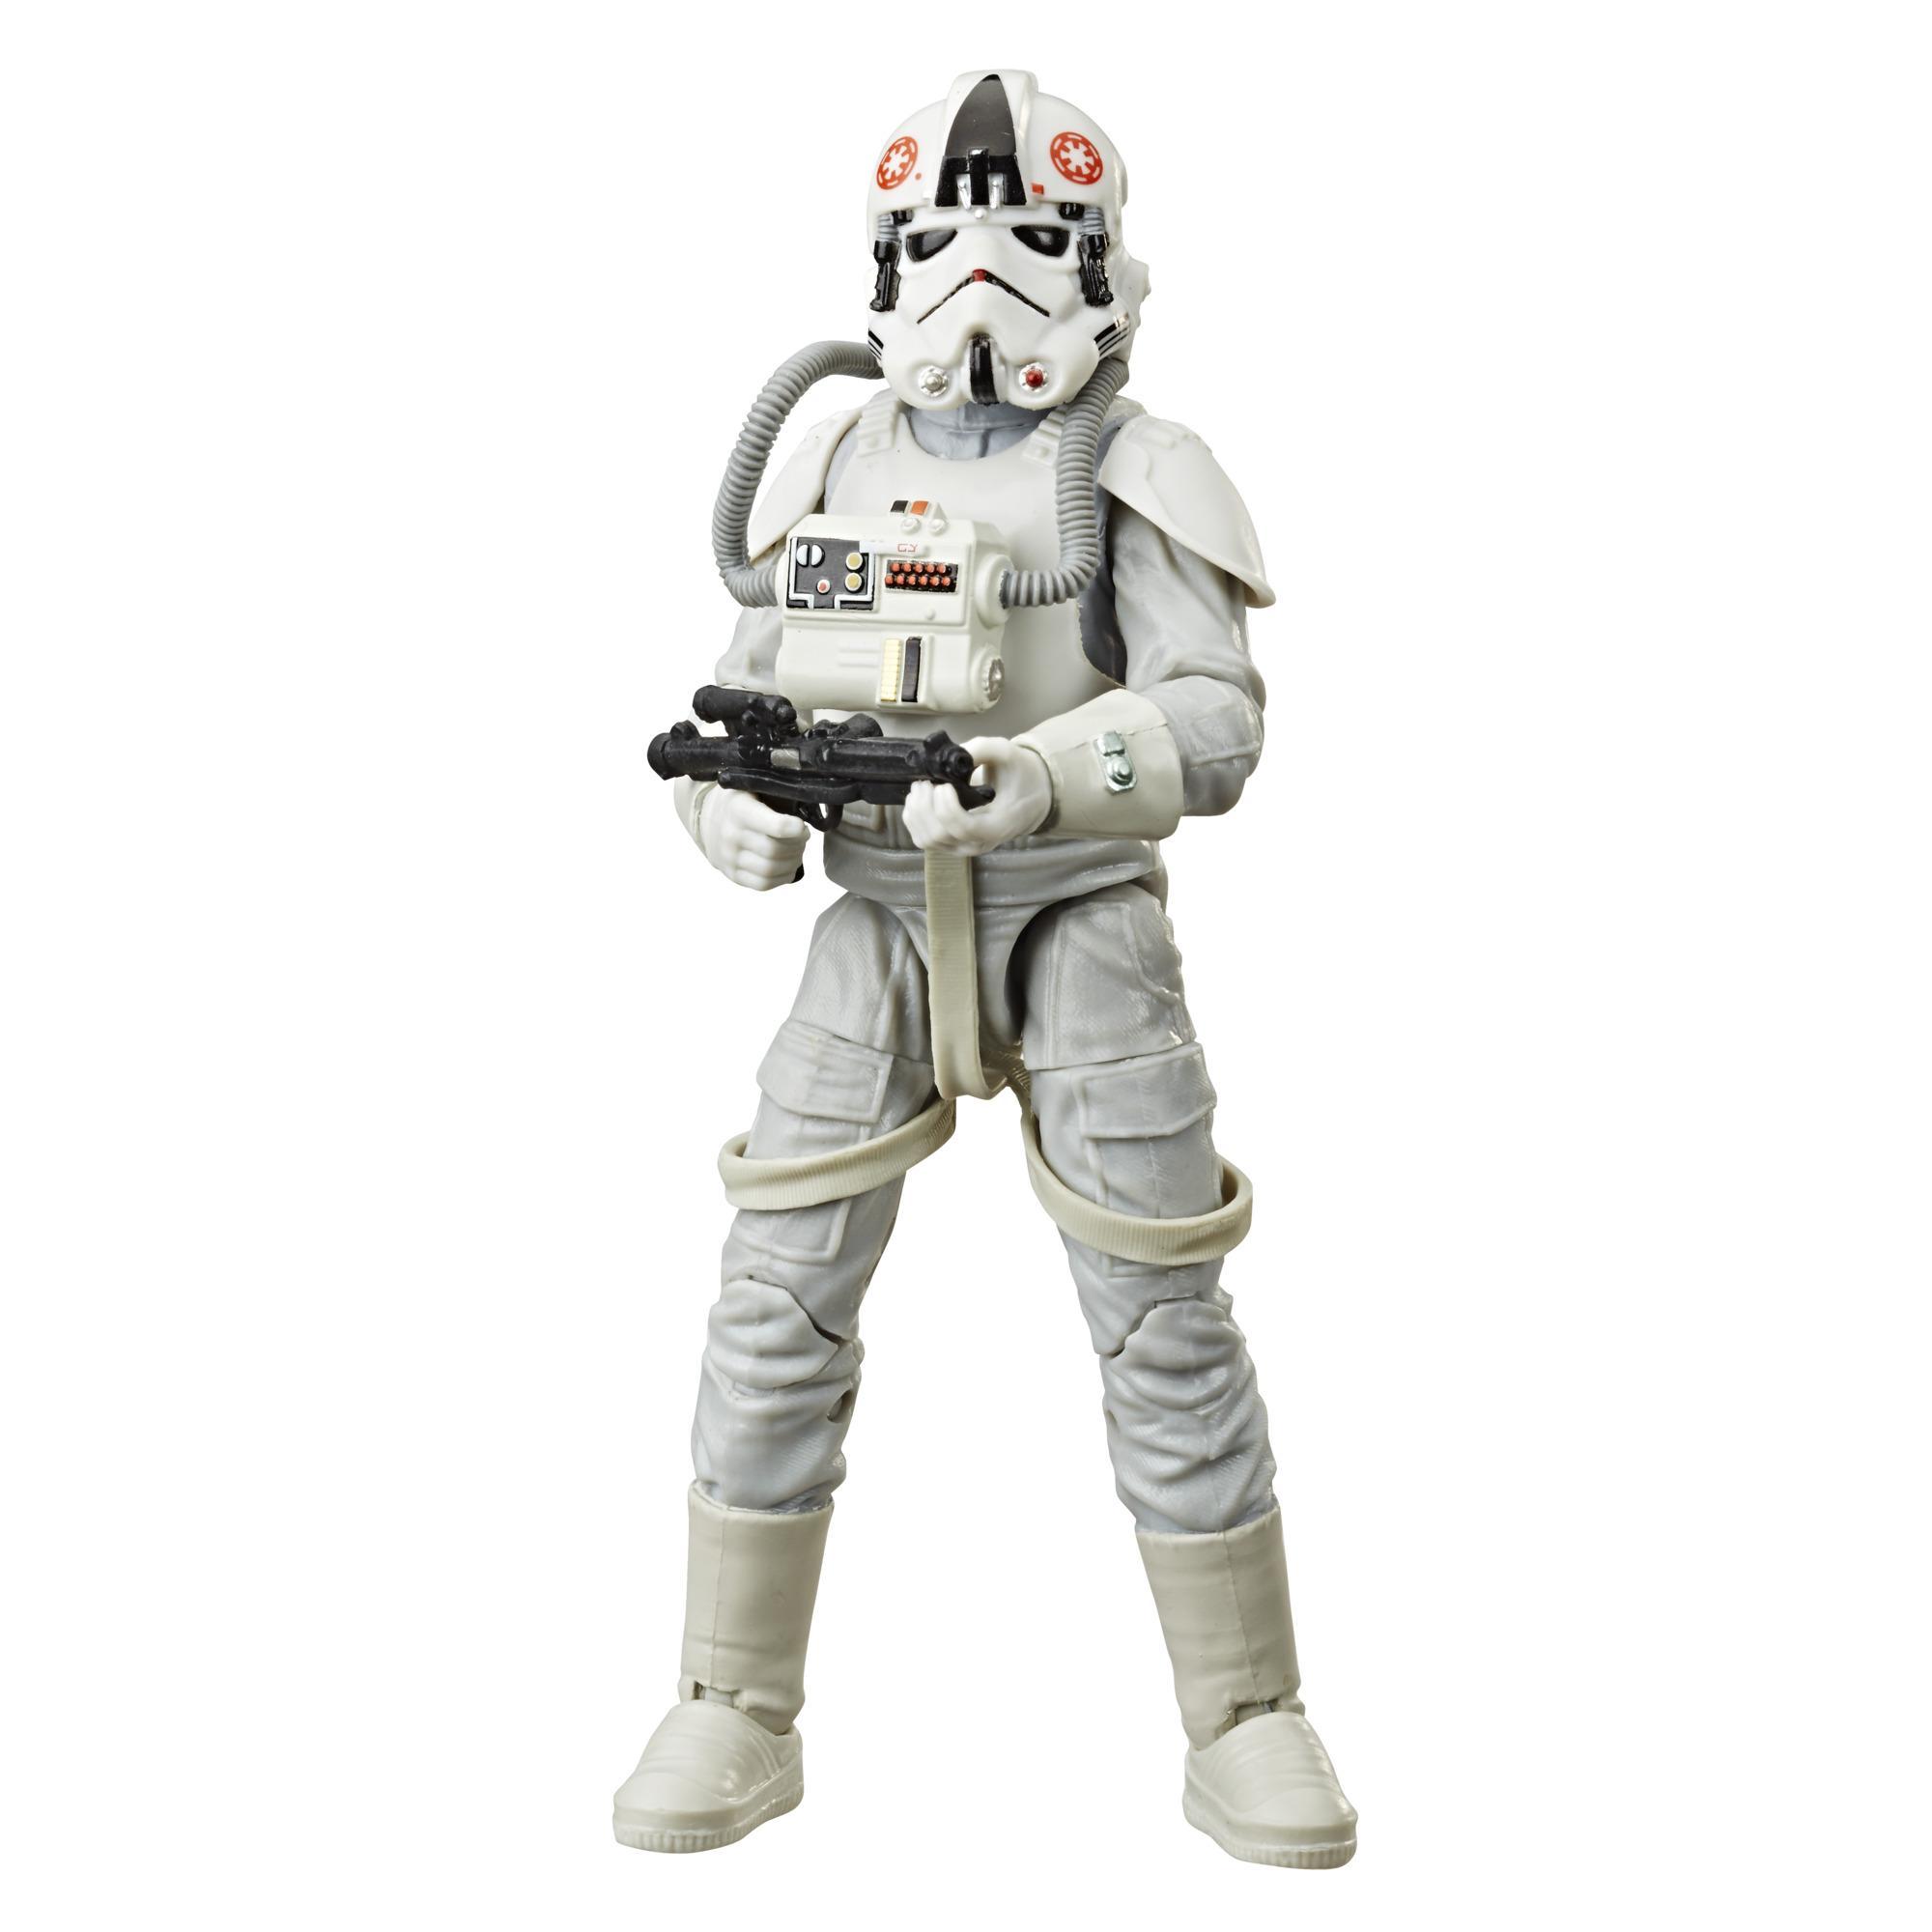 Star Wars The Black Series - AT-AT Driver de 15 cm - Star Wars: El Imperio contraataca - Figura del 40.º aniversario